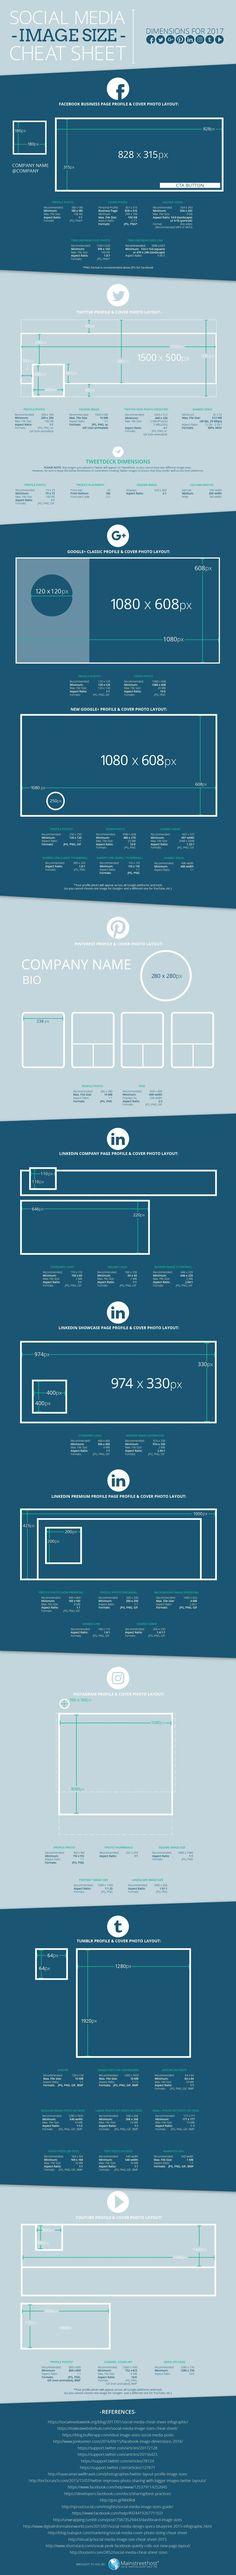 social media image dimensions